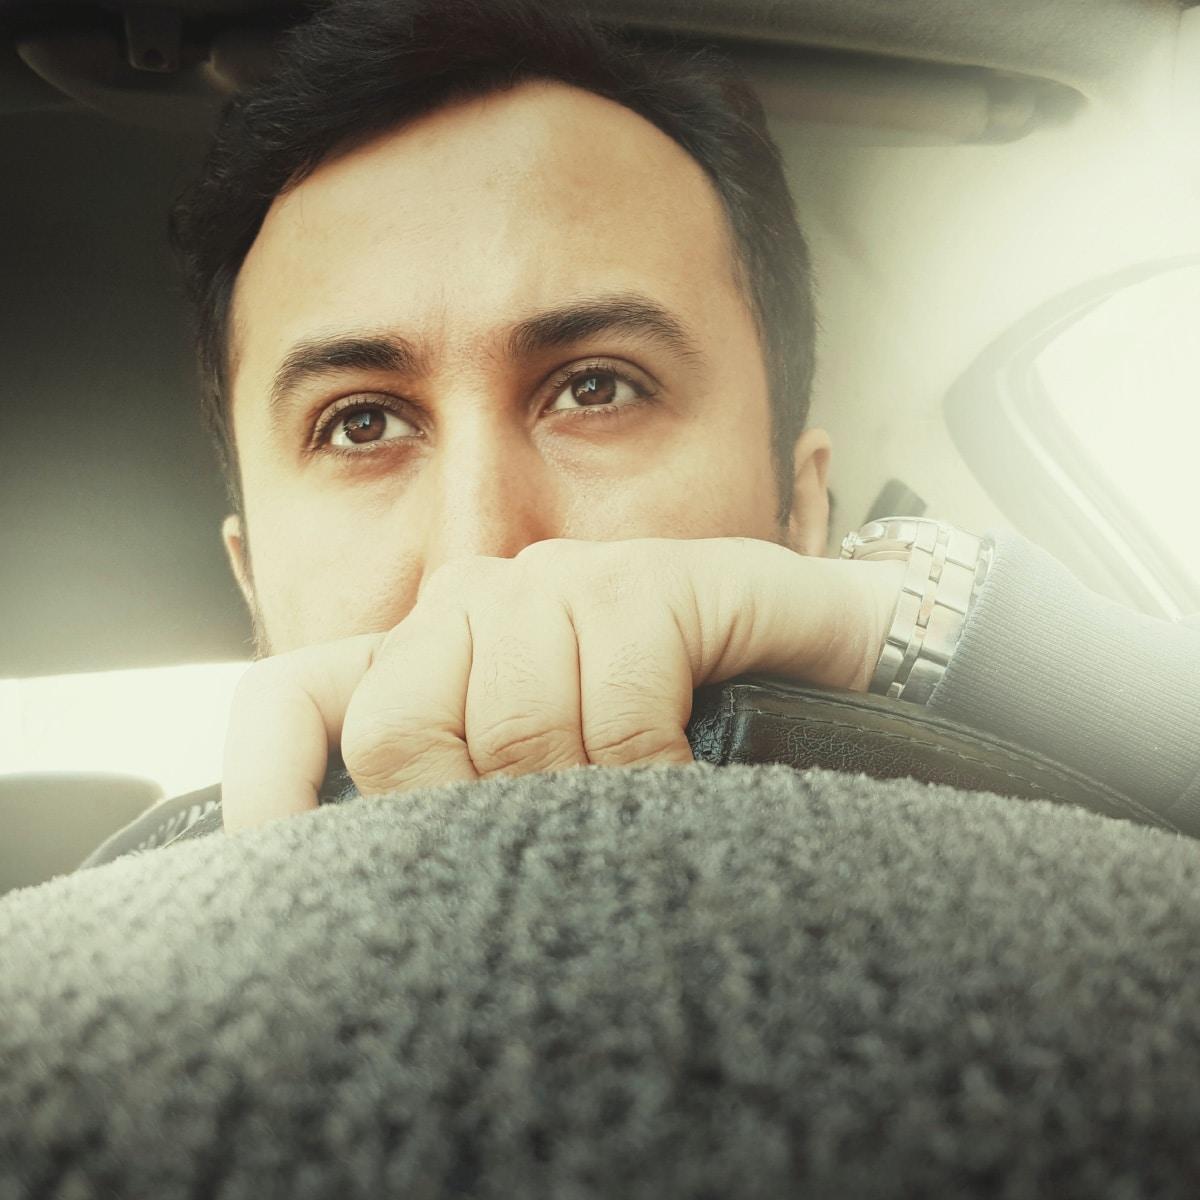 Go to Hasan Almasi's profile